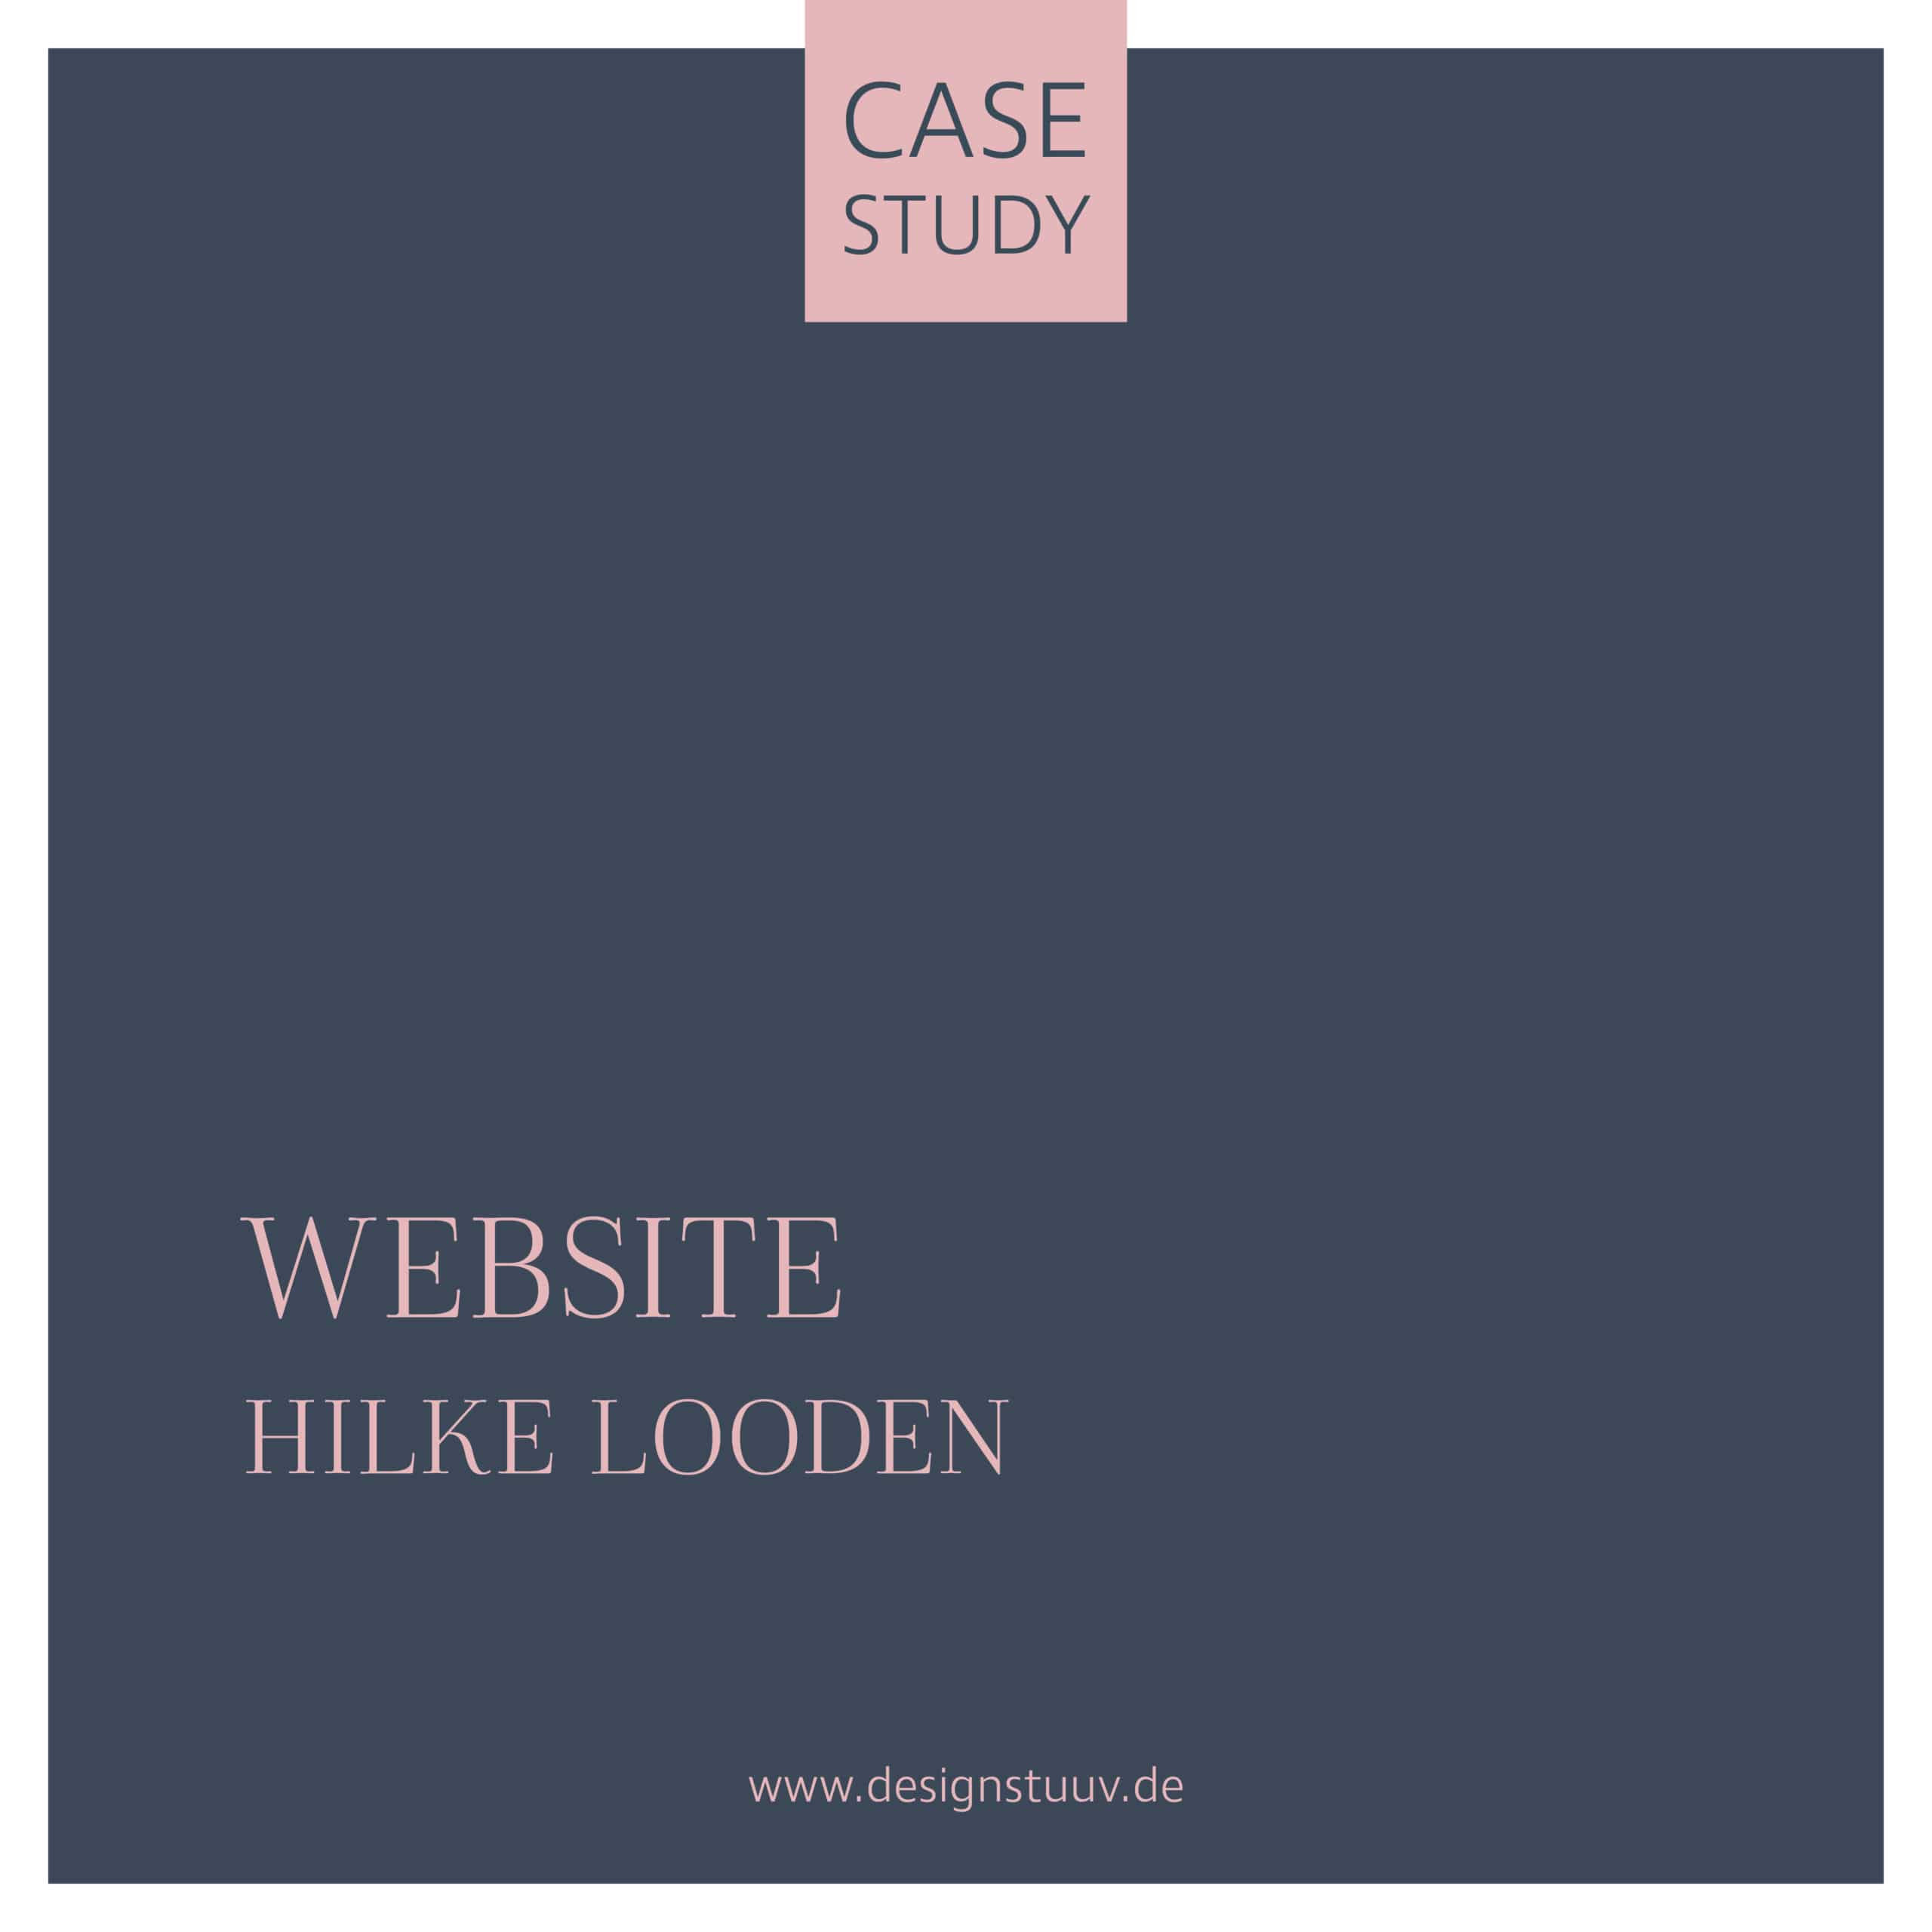 Website Hilke Looden